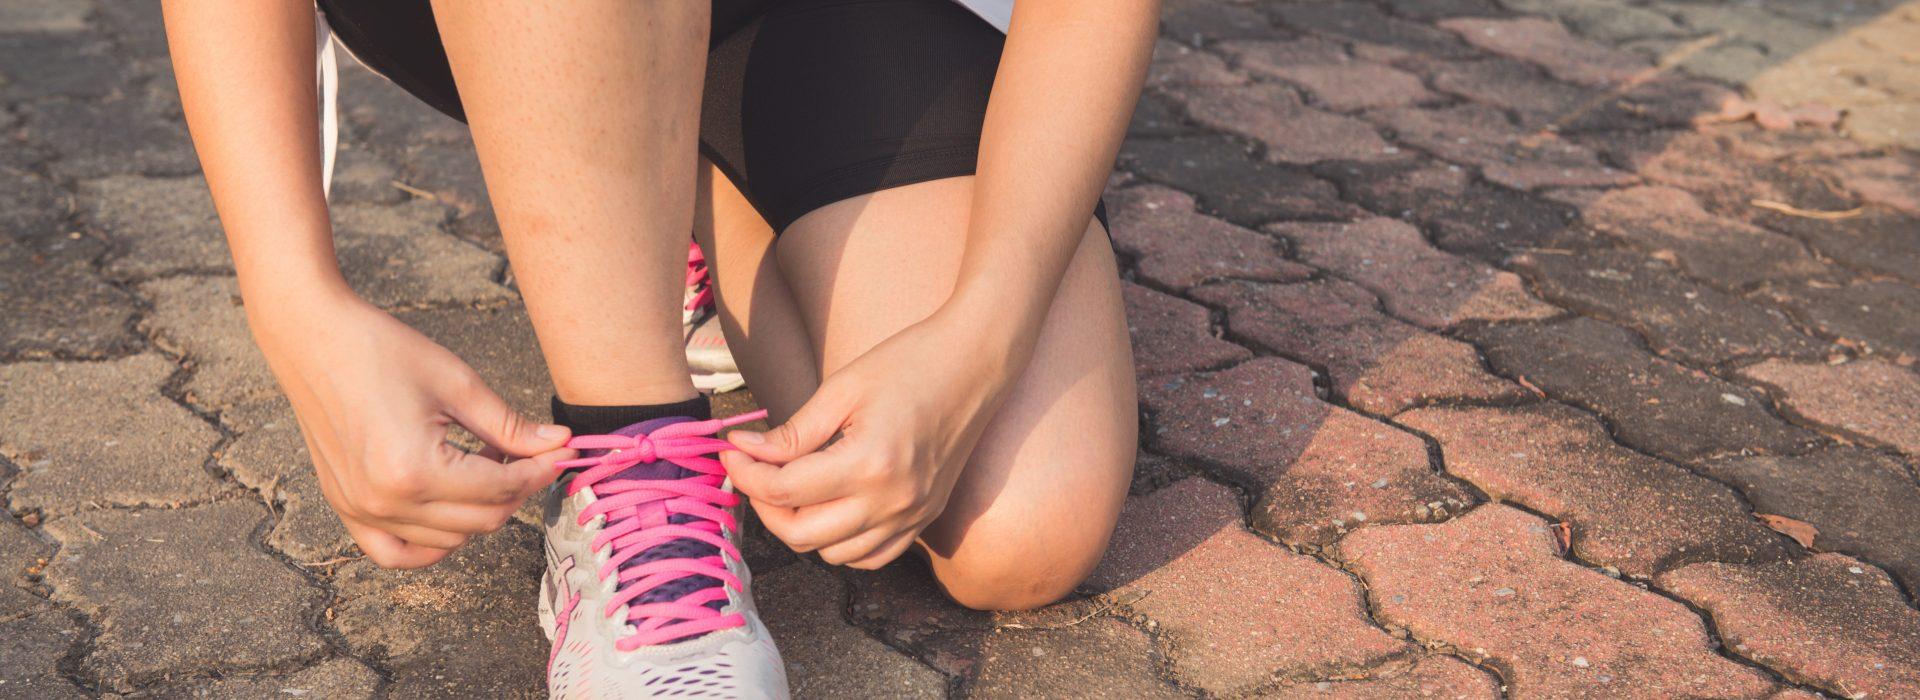 exercise-female-fitness-foot-601177